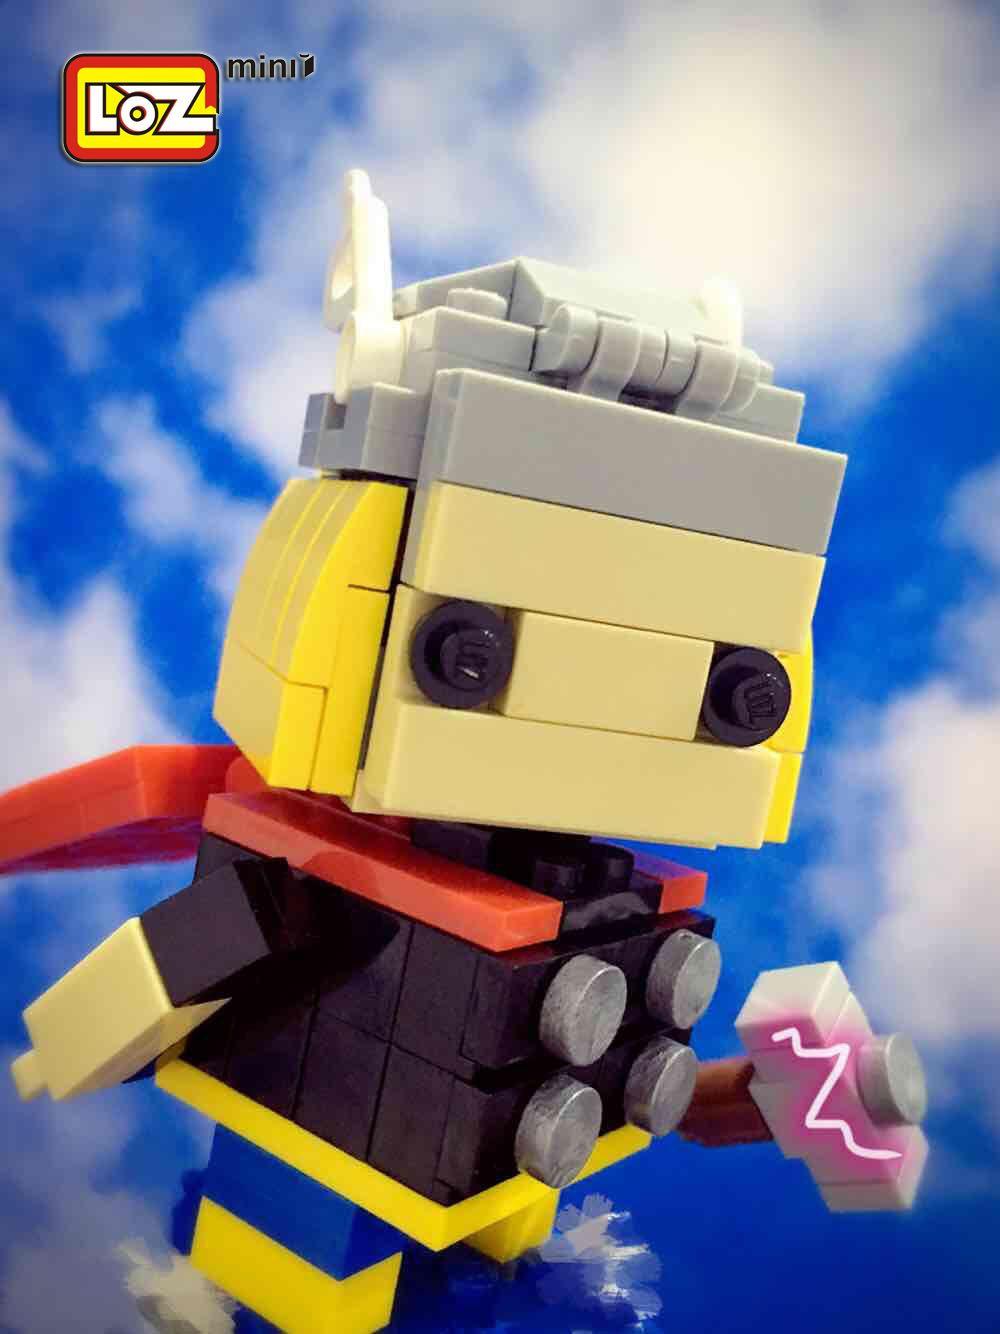 Loz mini thor in skylozblock lego miniblock toy